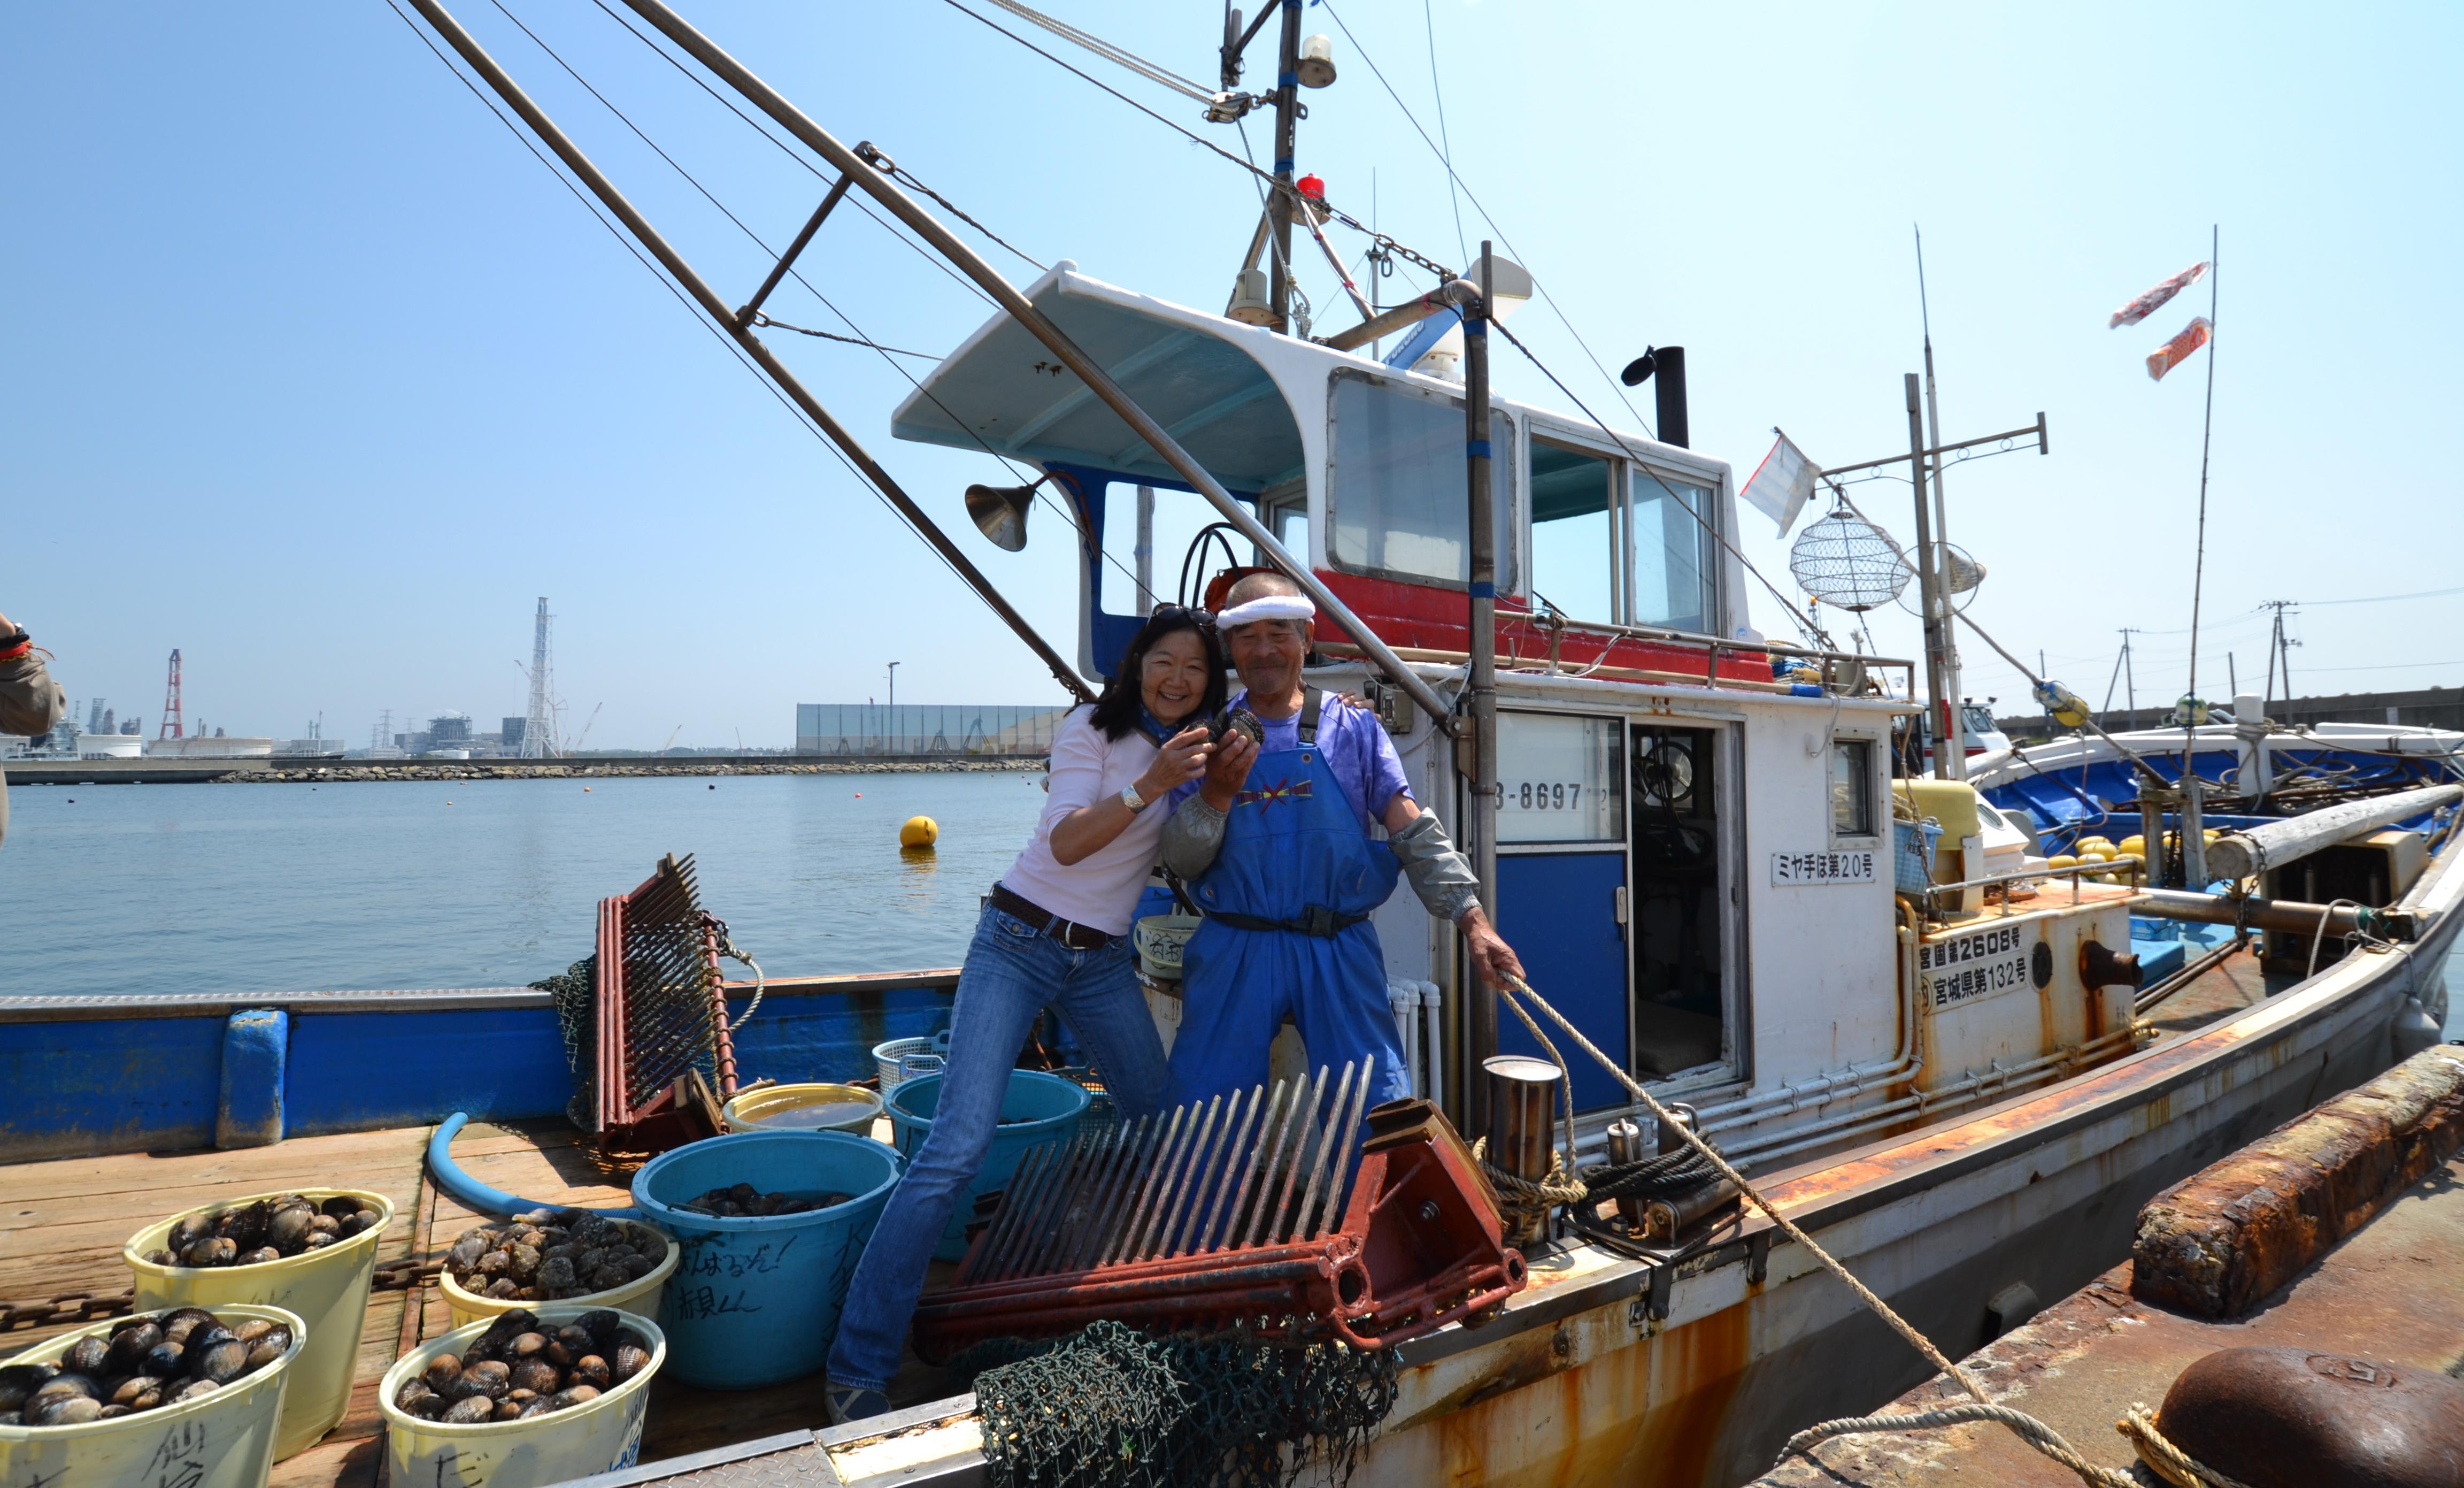 arahama sato fisherman on boat w linda.JPG